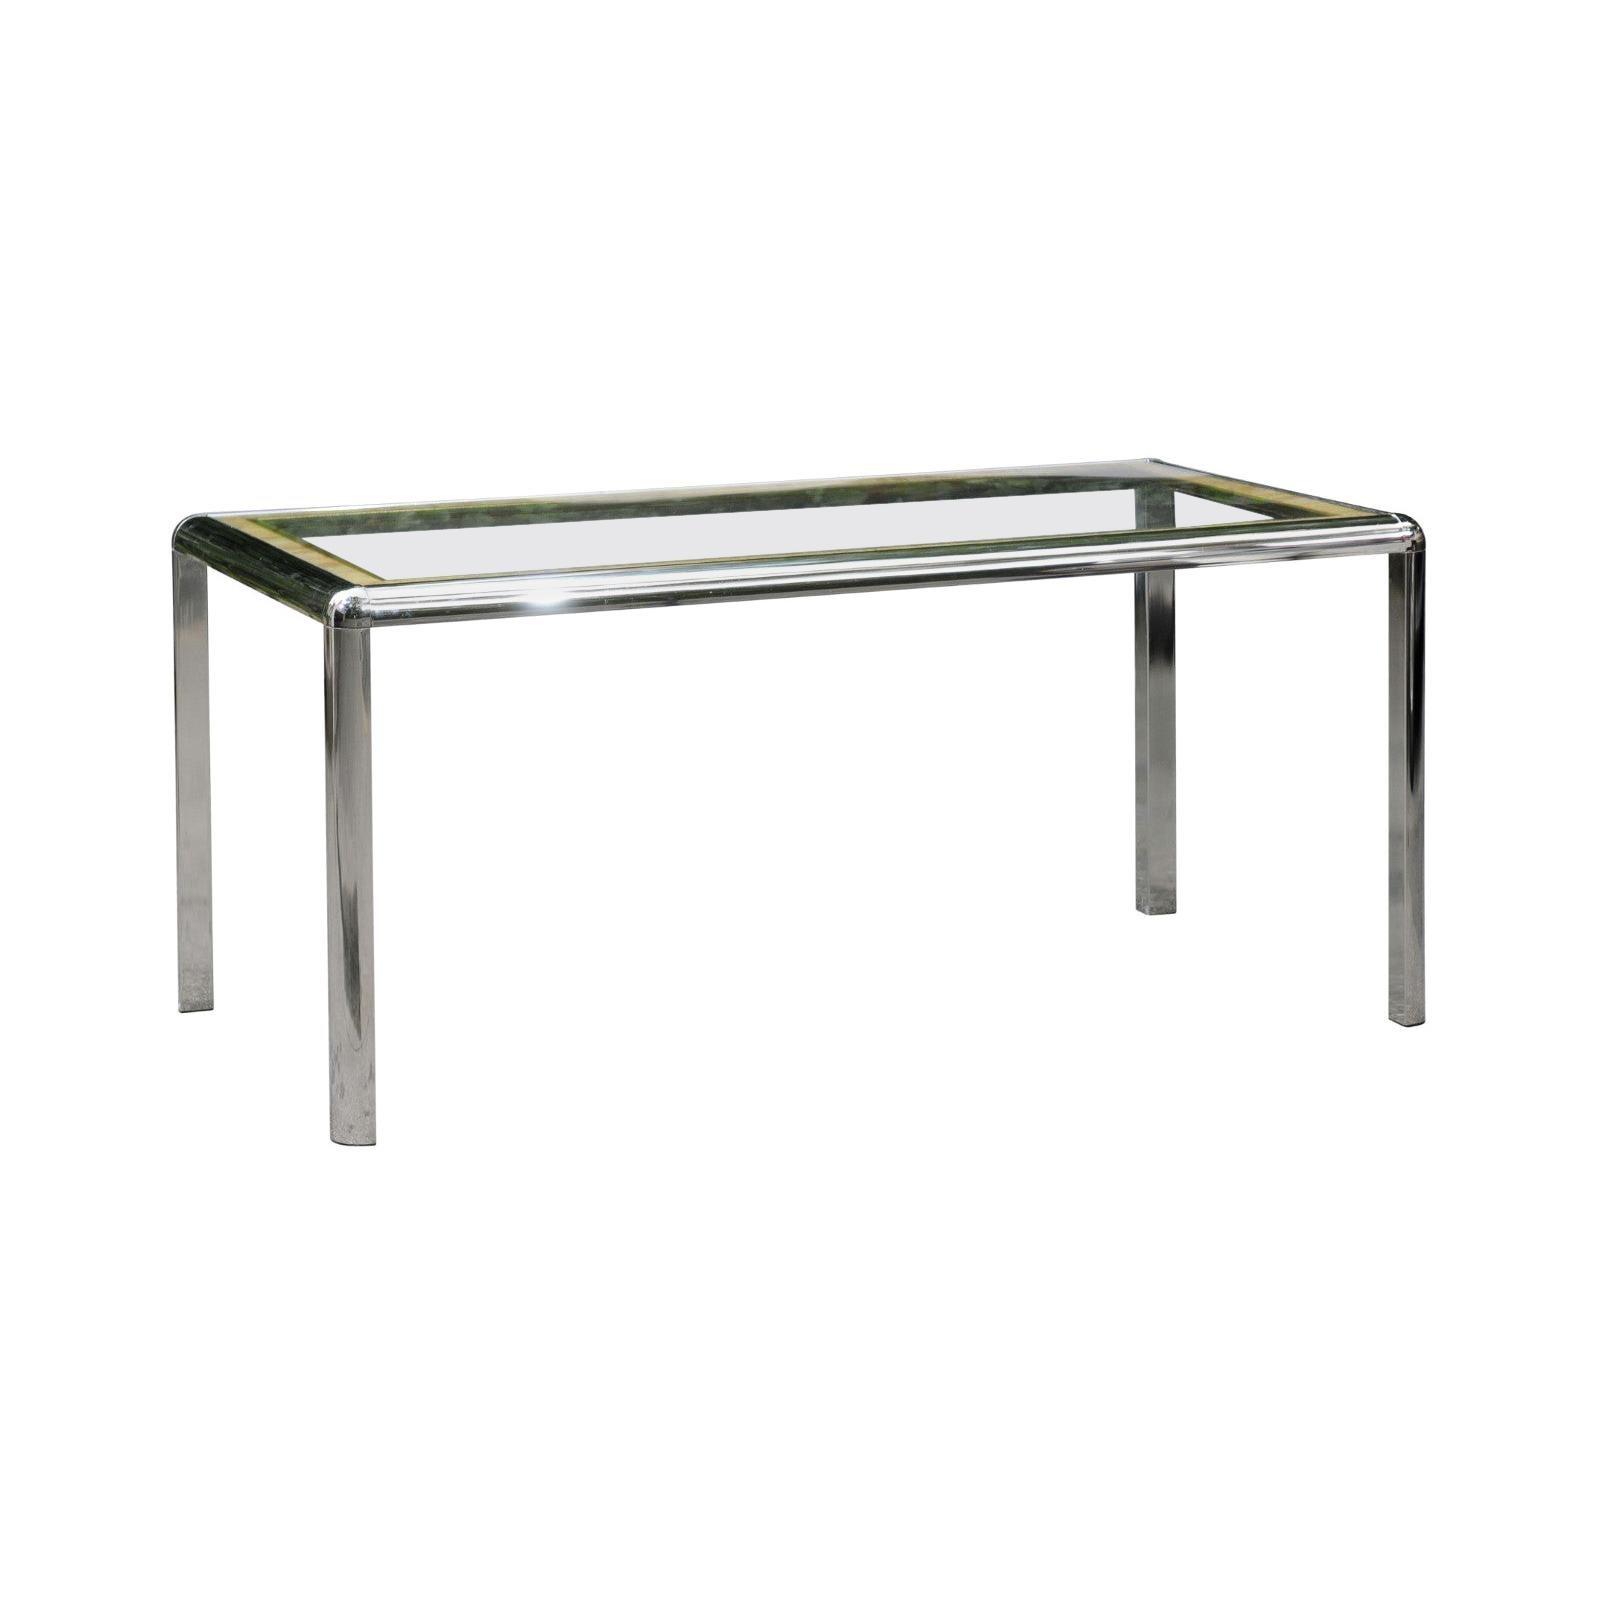 Stellar Italian Steel, Cane and Brass Dining or Writing Table, circa 1970